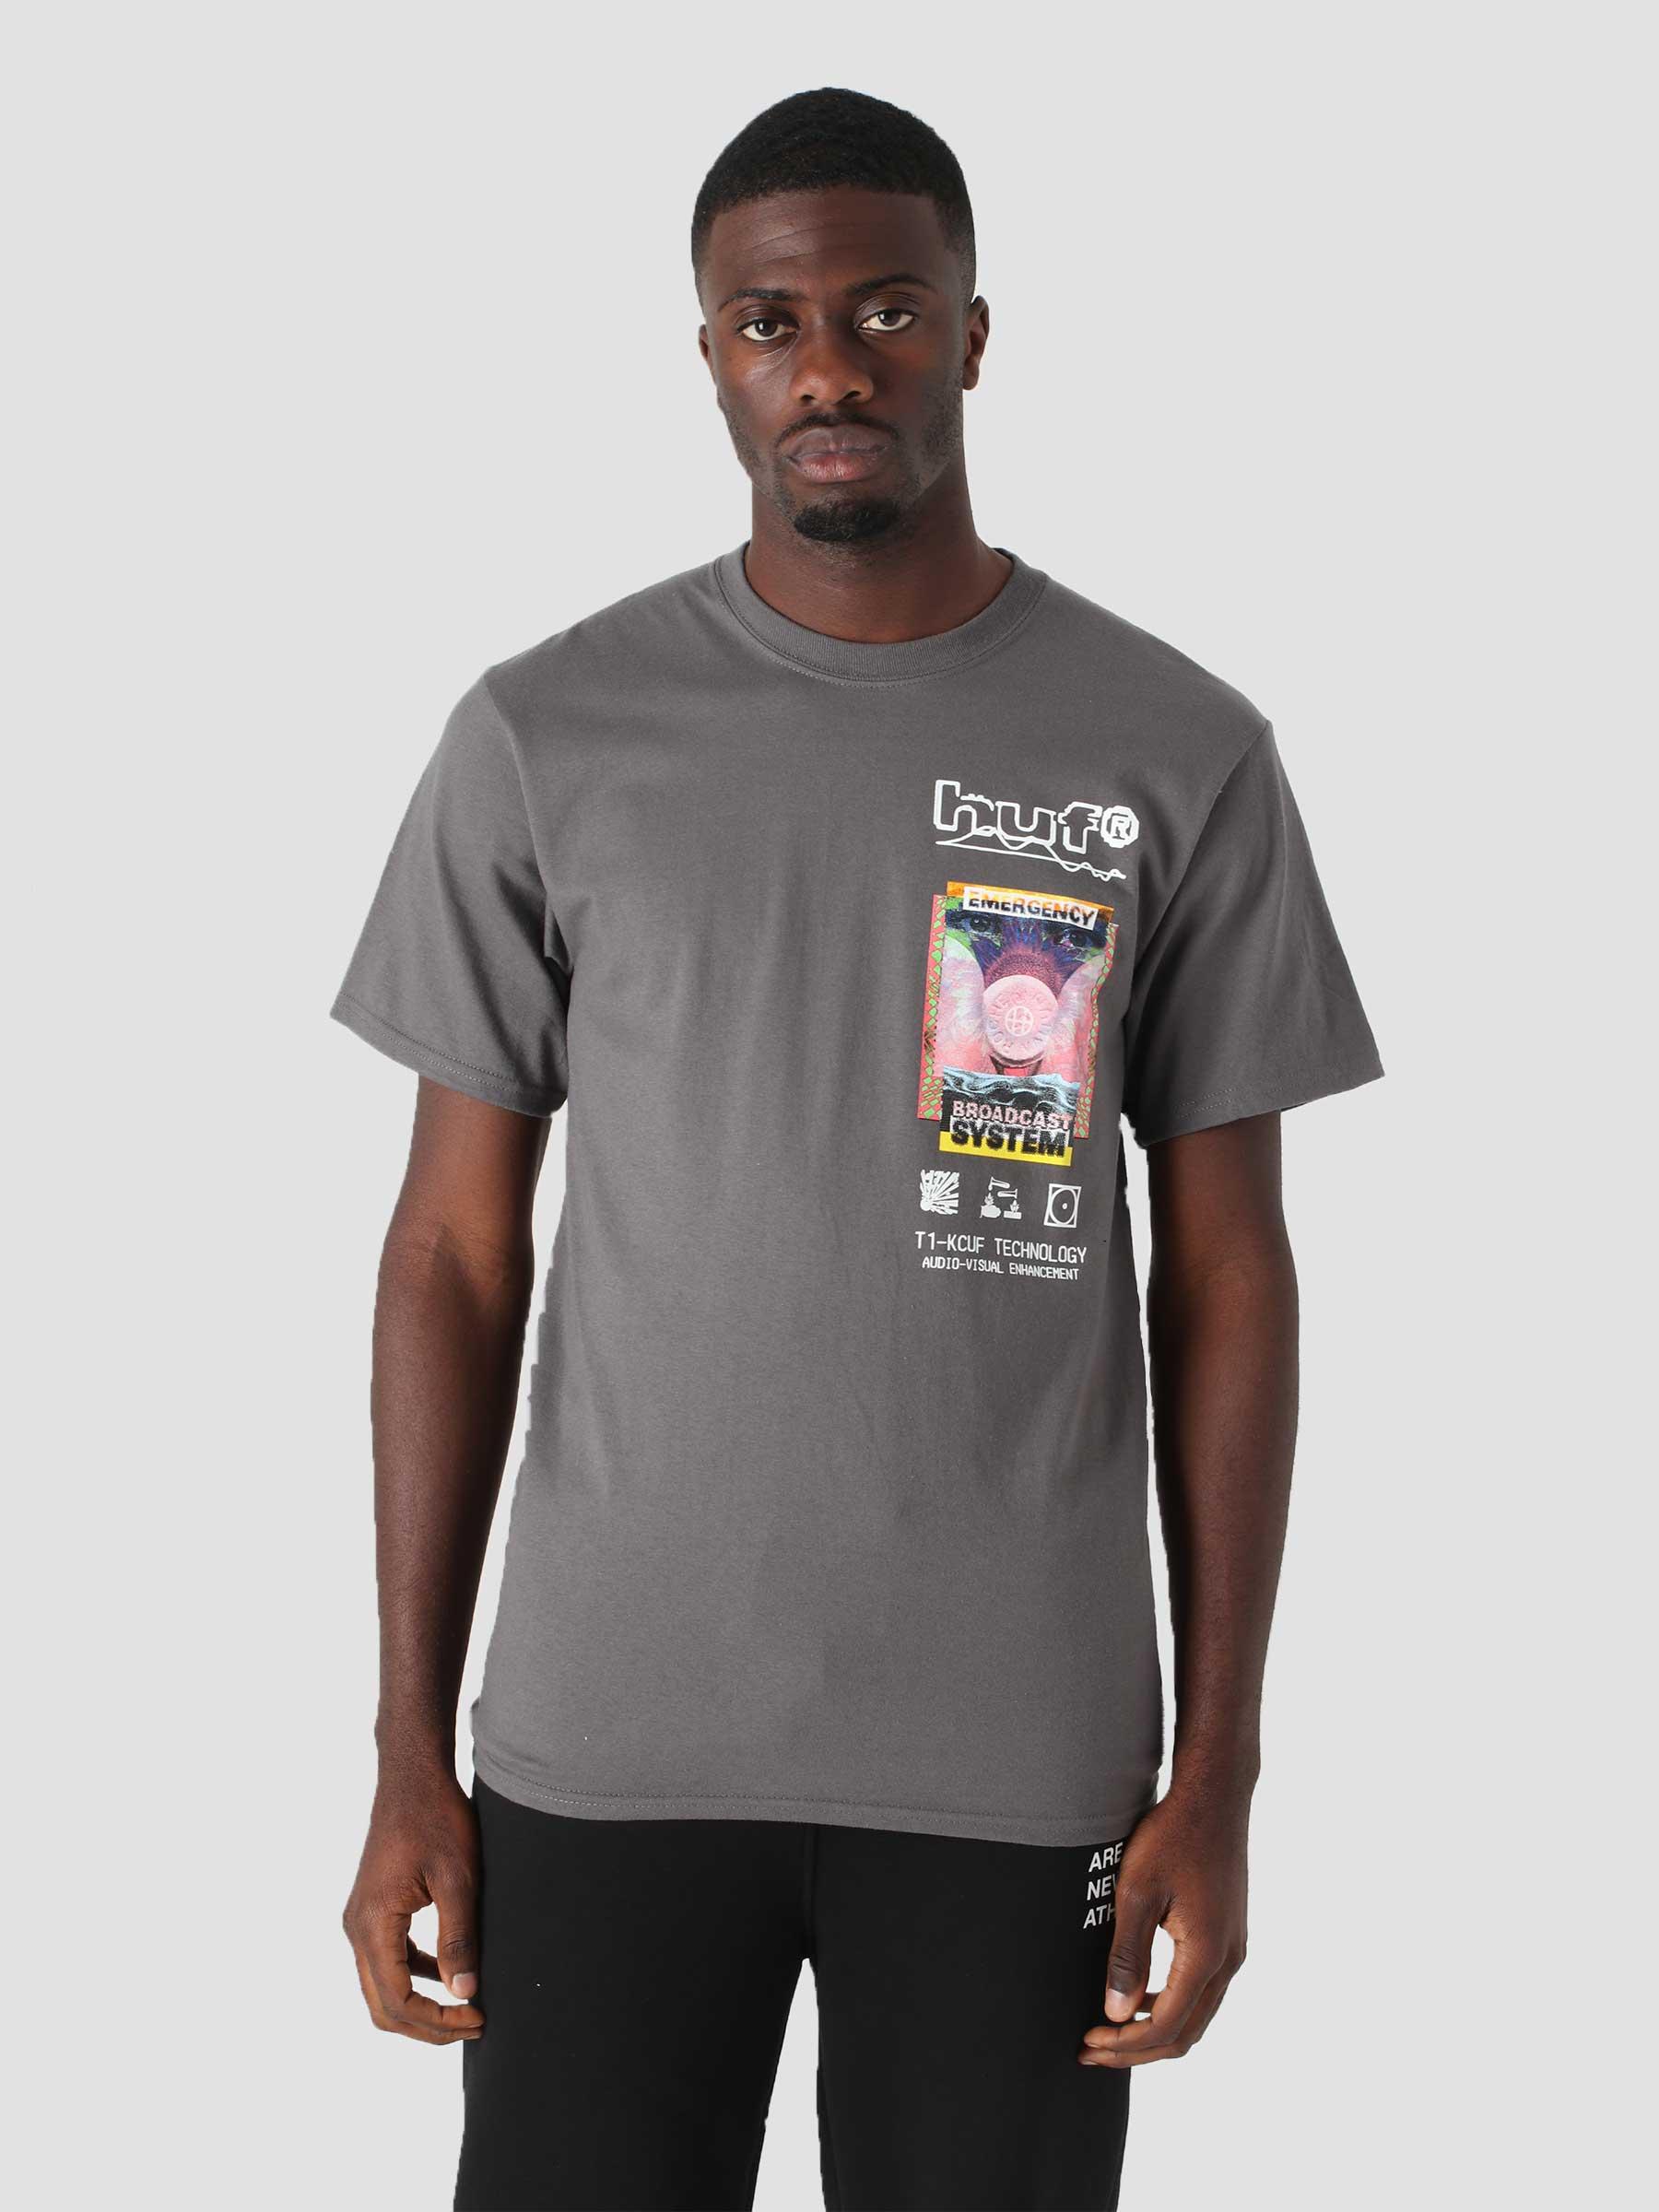 Emergency System T-Shirt Charcoal TS01519-CHARC